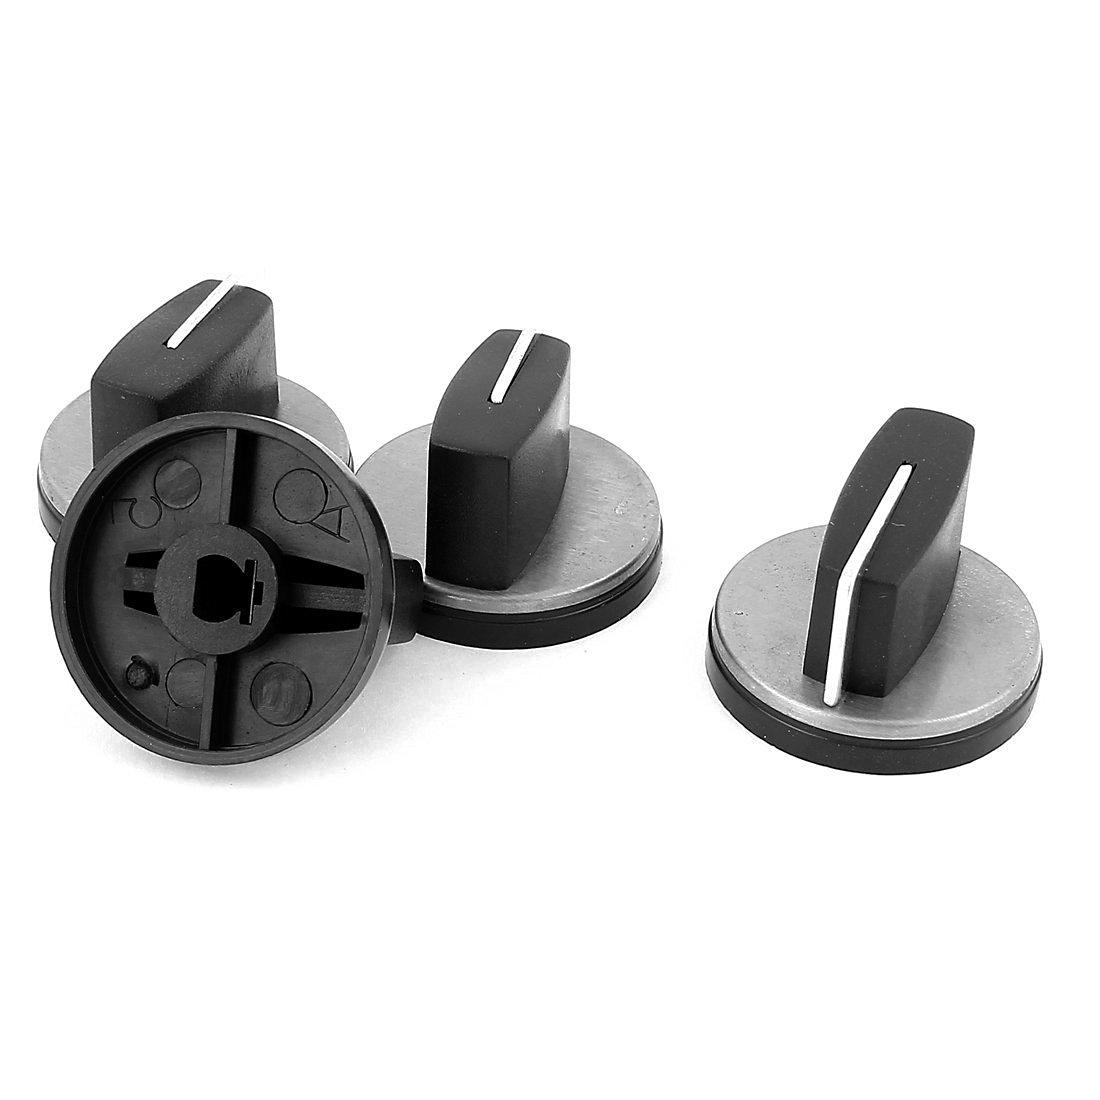 knob ignition cap - SODIAL(R) 4 in 1 Embedded gas stove stove knob knob ignition cap ignition switch